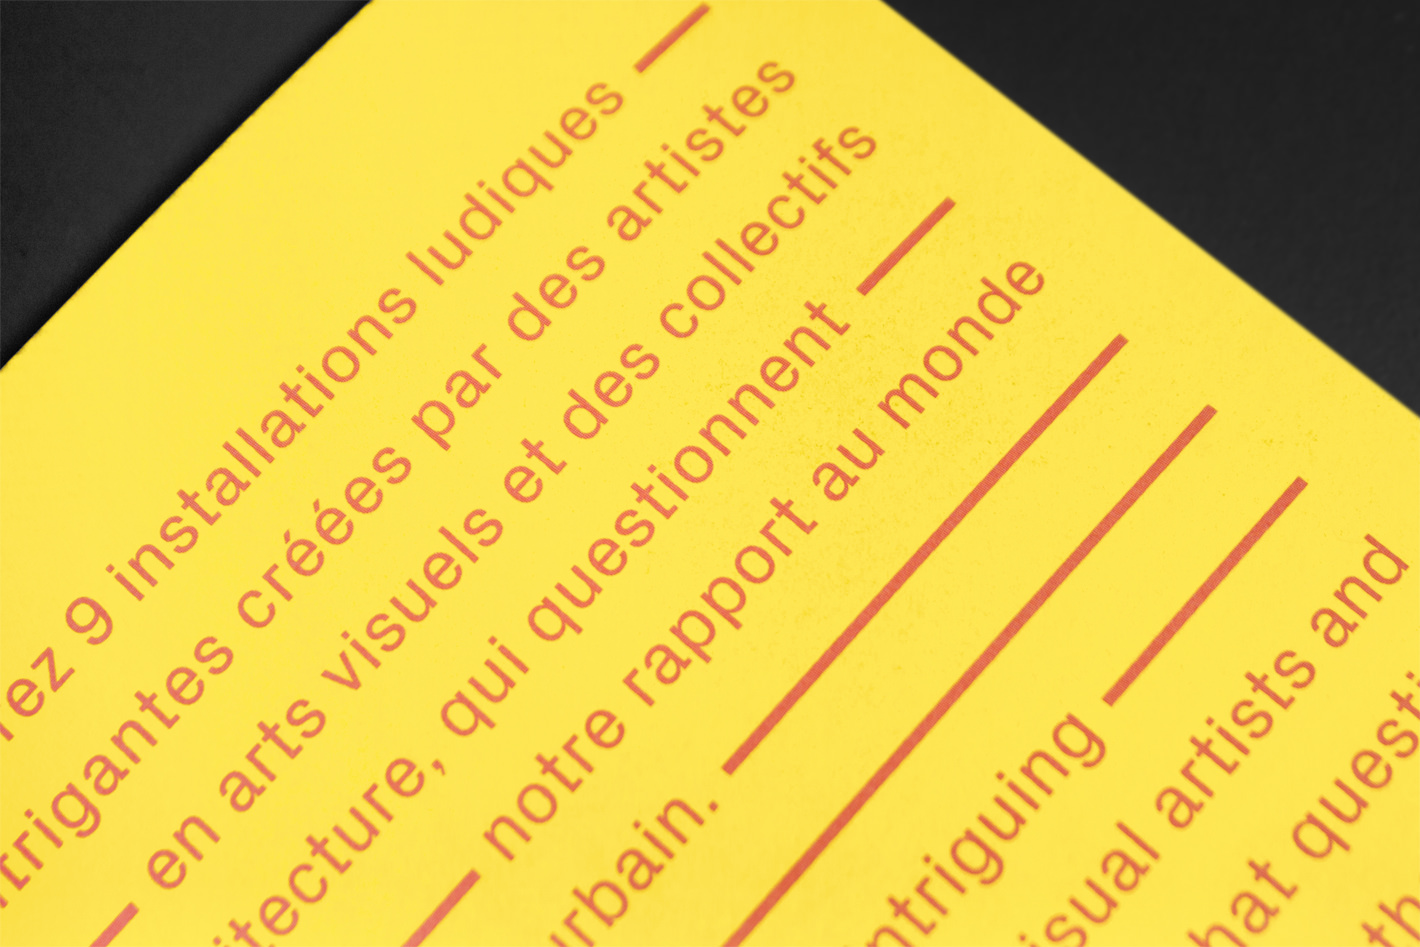 Figure-Jeremy-Hall-Design-Graphique-Logo-Branding-Image-De-Marque-Jelimagine-7.jpg